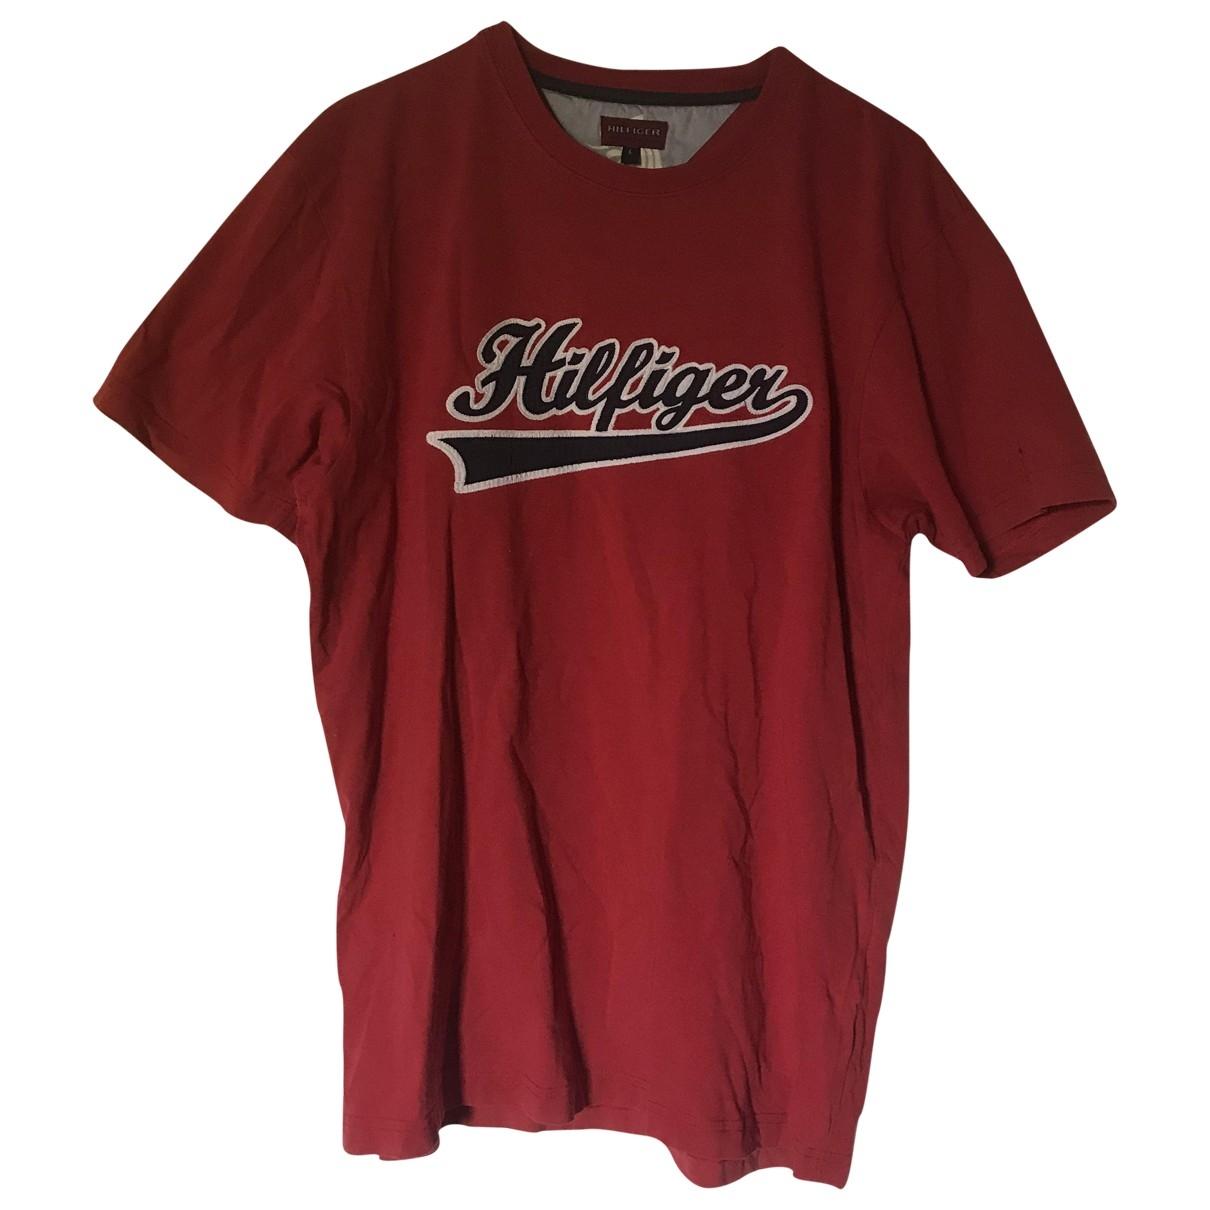 Tommy Hilfiger \N Red Cotton T-shirts for Men L International